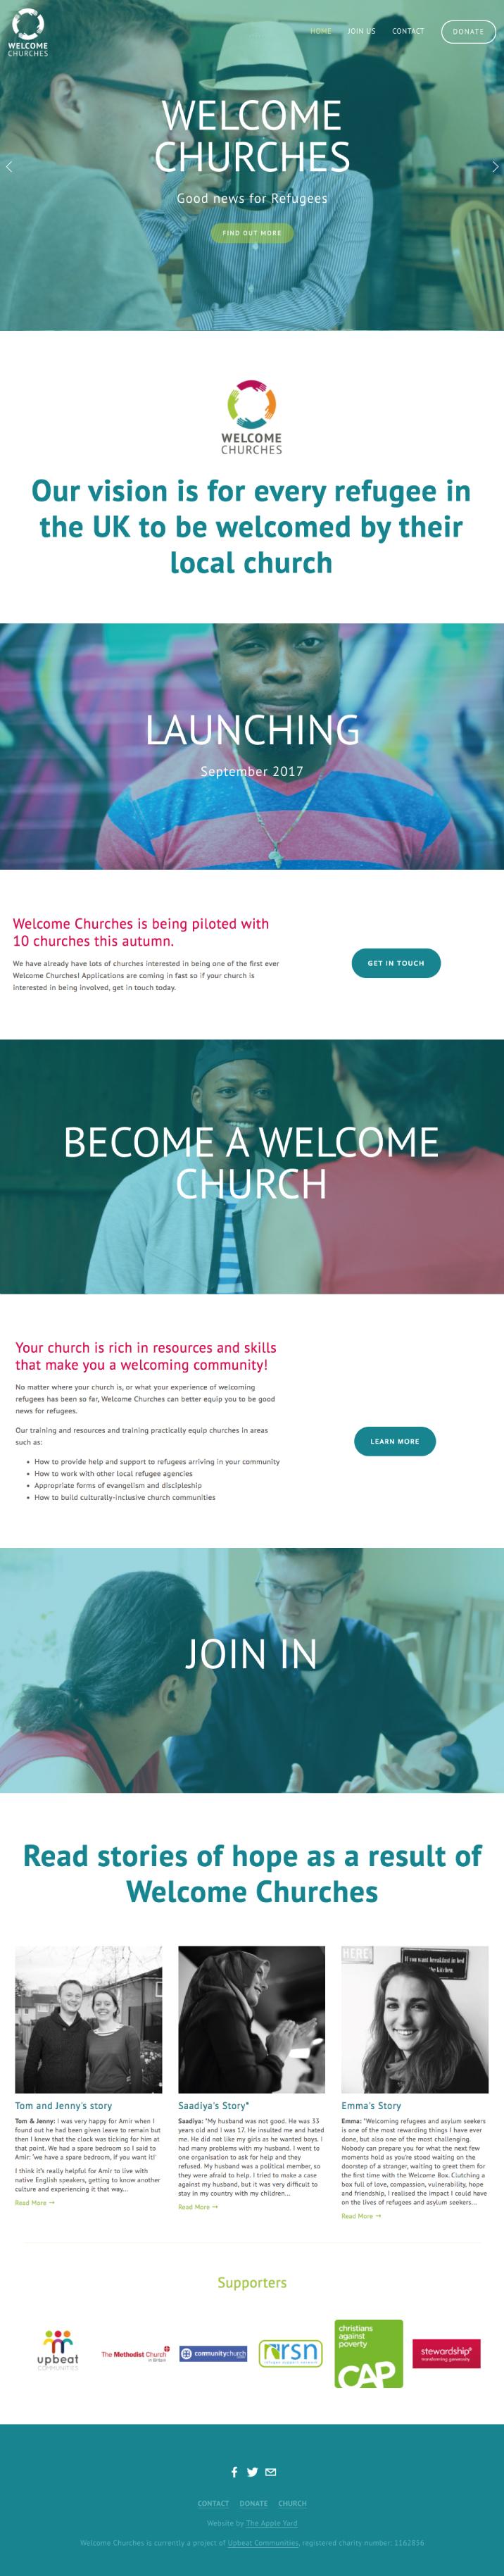 Welcome-Churches.jpg